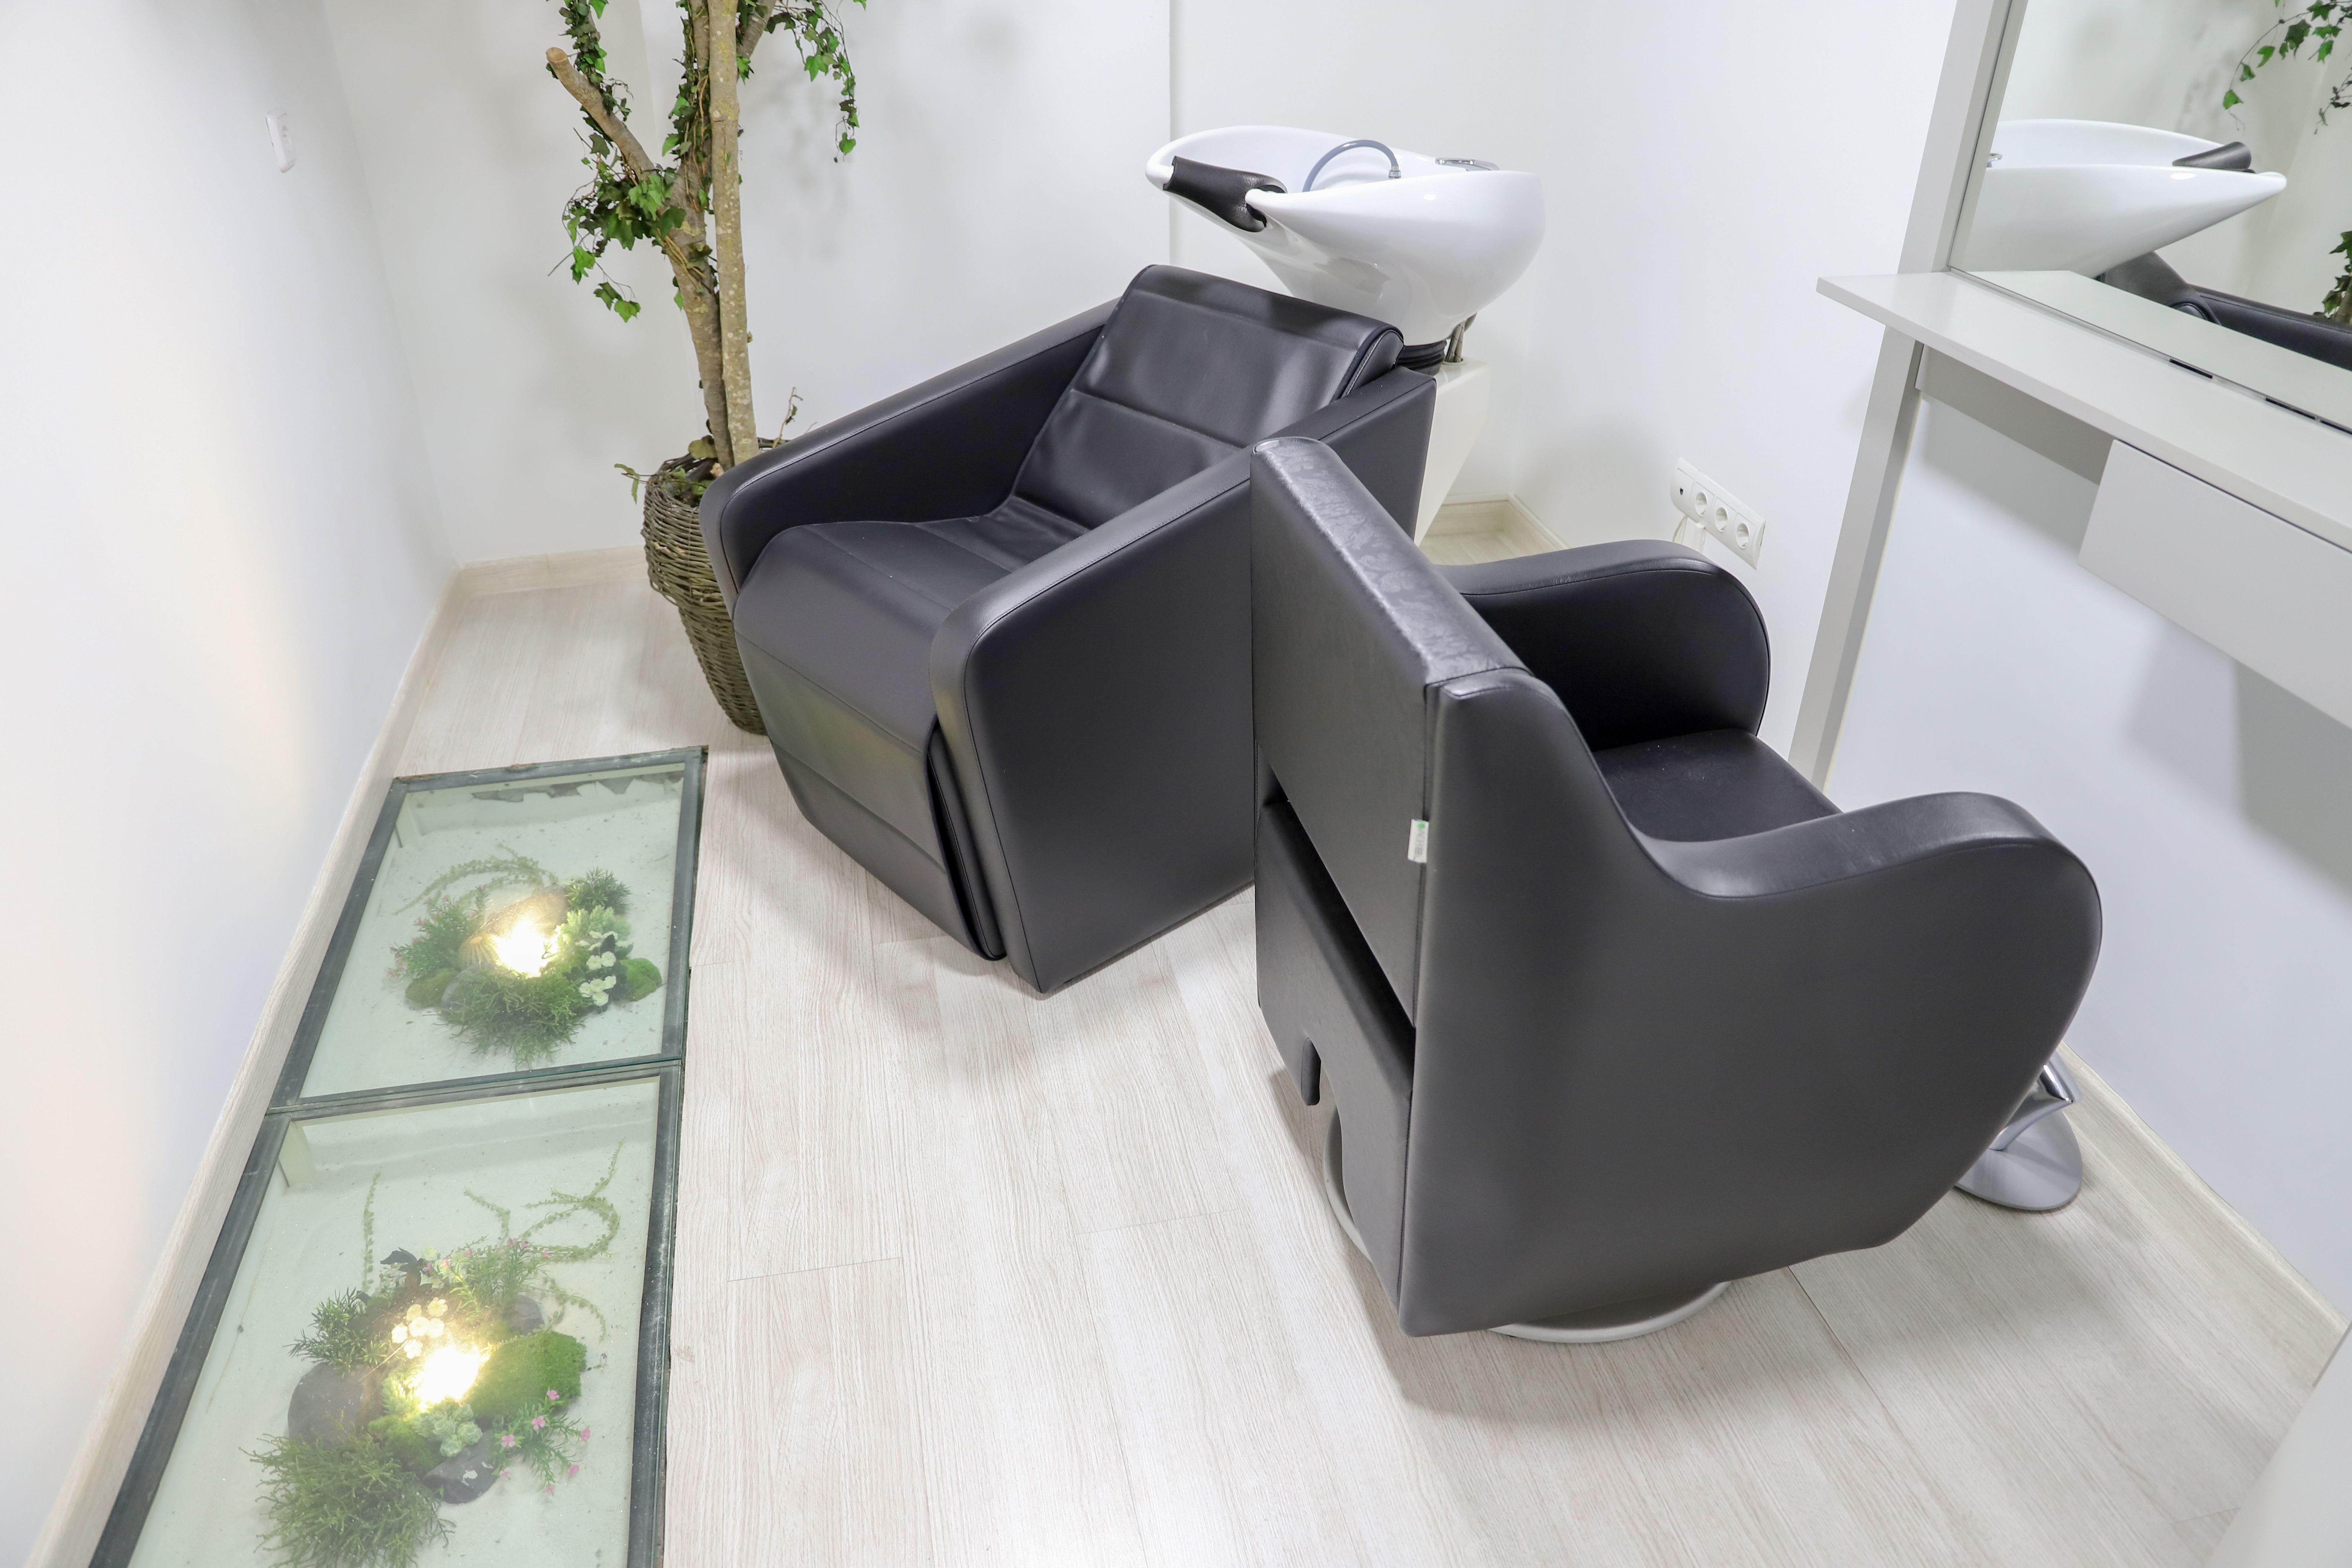 Sala de lavado de cabezas